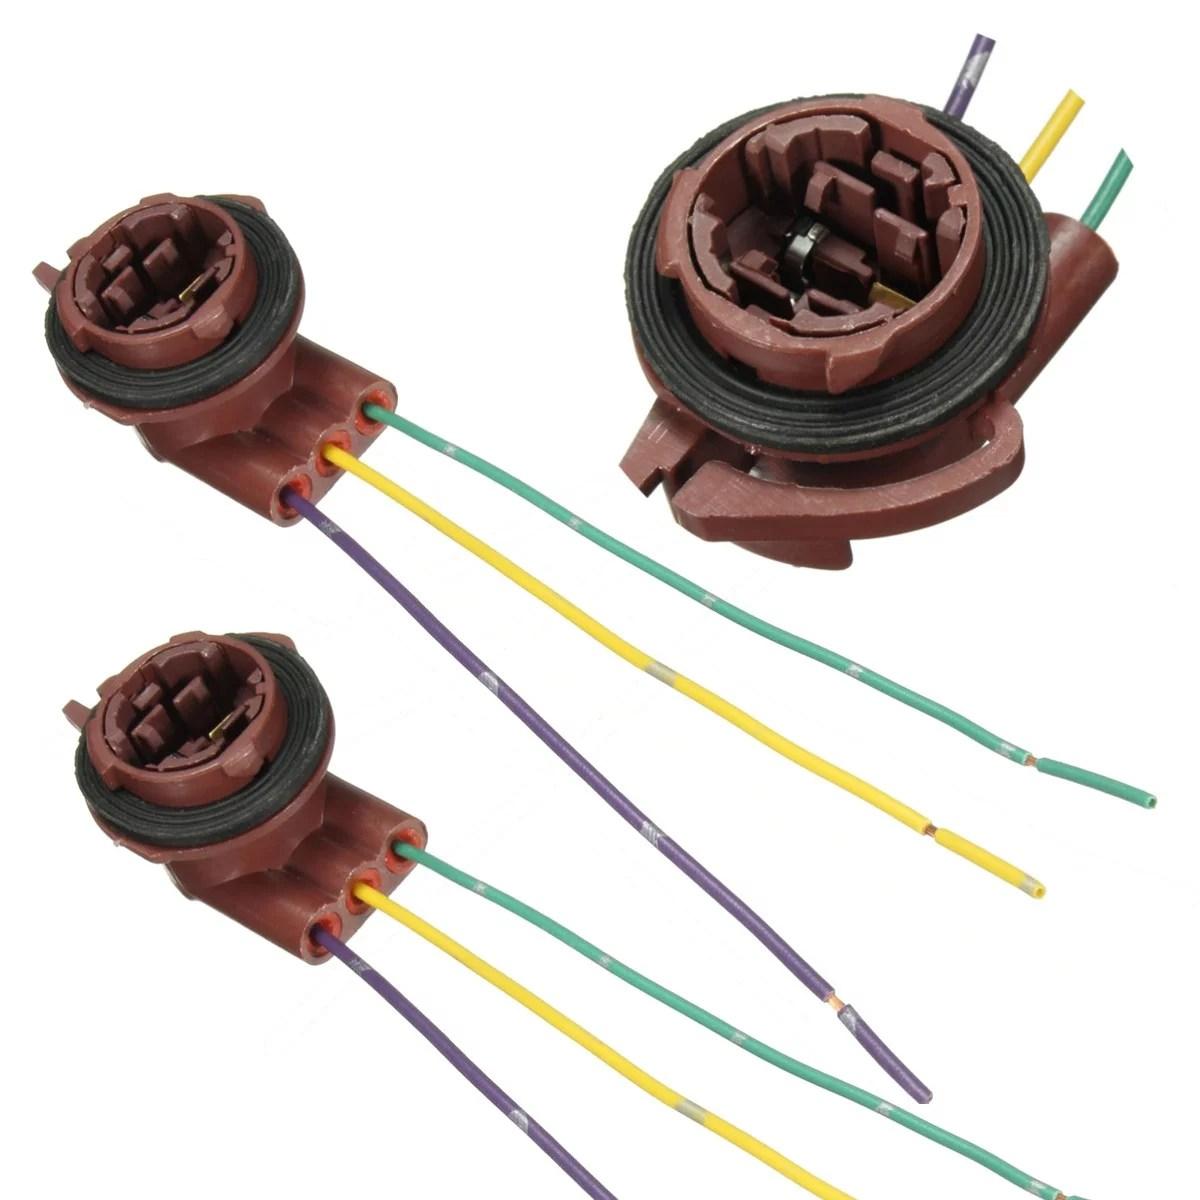 medium resolution of matcc 2pcs 12v brake turn signal indicator light socket wiring ford 4000 tractor wiring diagram 12v plug wiring harness adapter